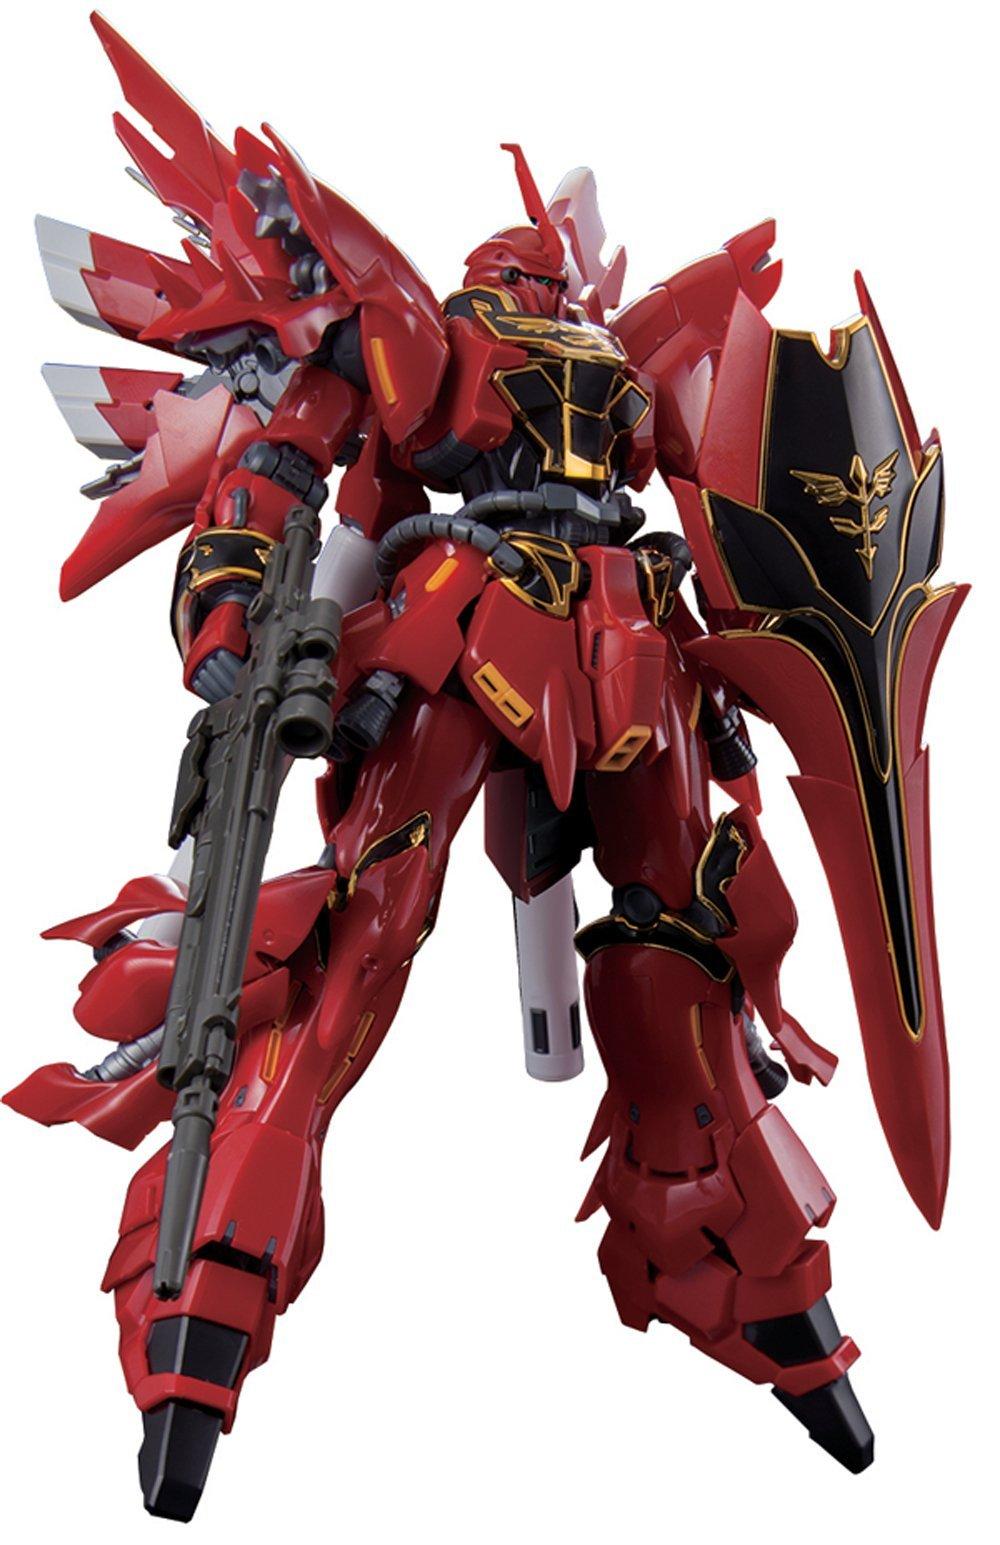 Bandai Hobby RG MSN-06S Sinanju Gundam UC Action Figure (1/144 Scale)